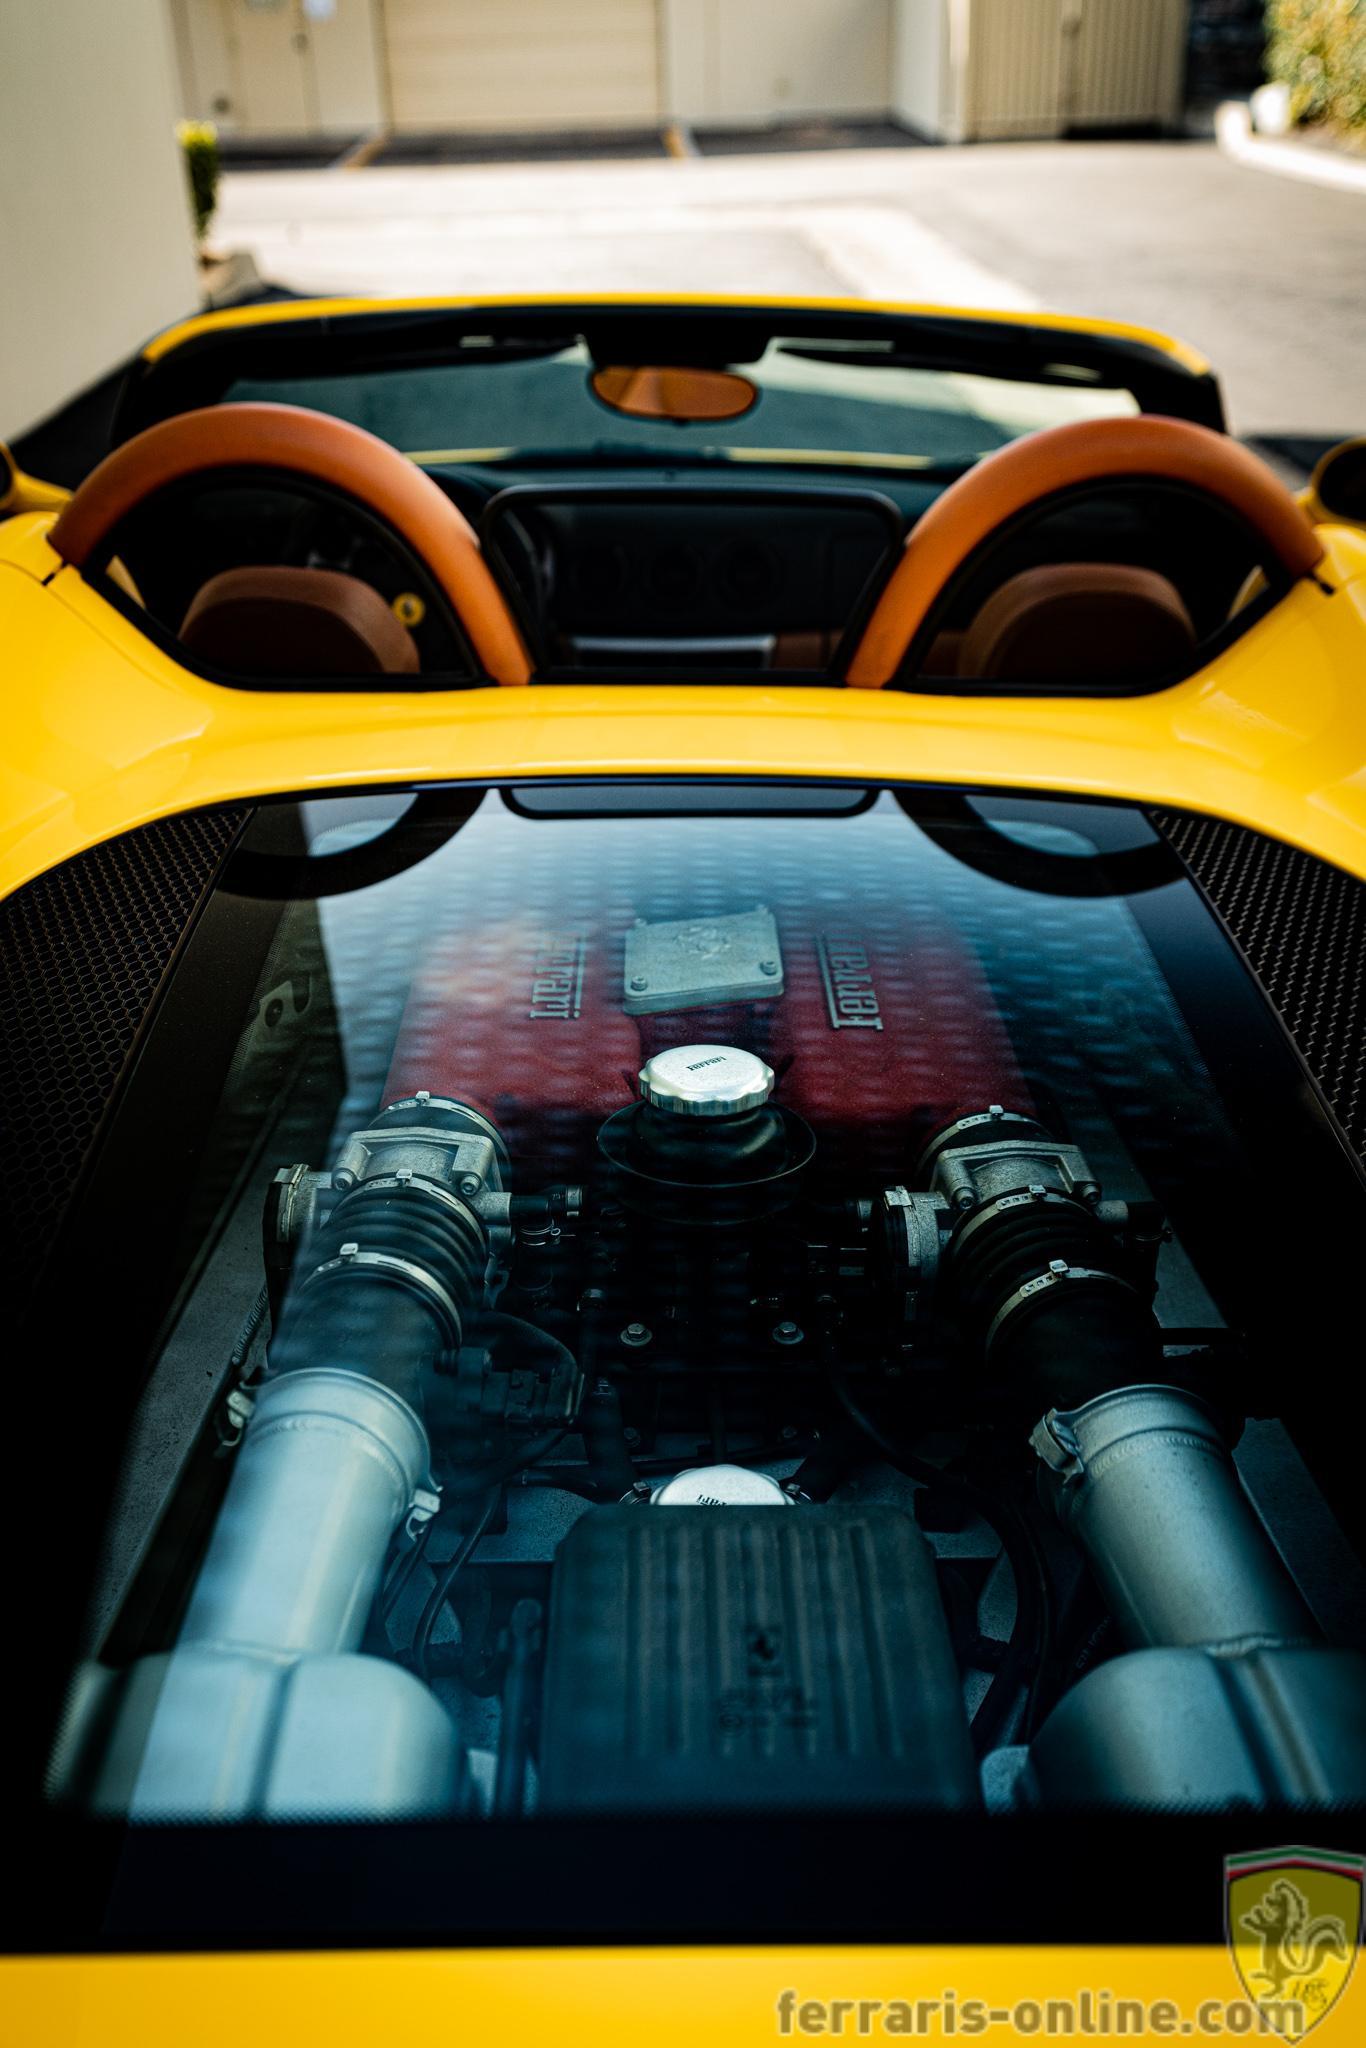 2002 Ferrari 360 spider 6-speed #128751